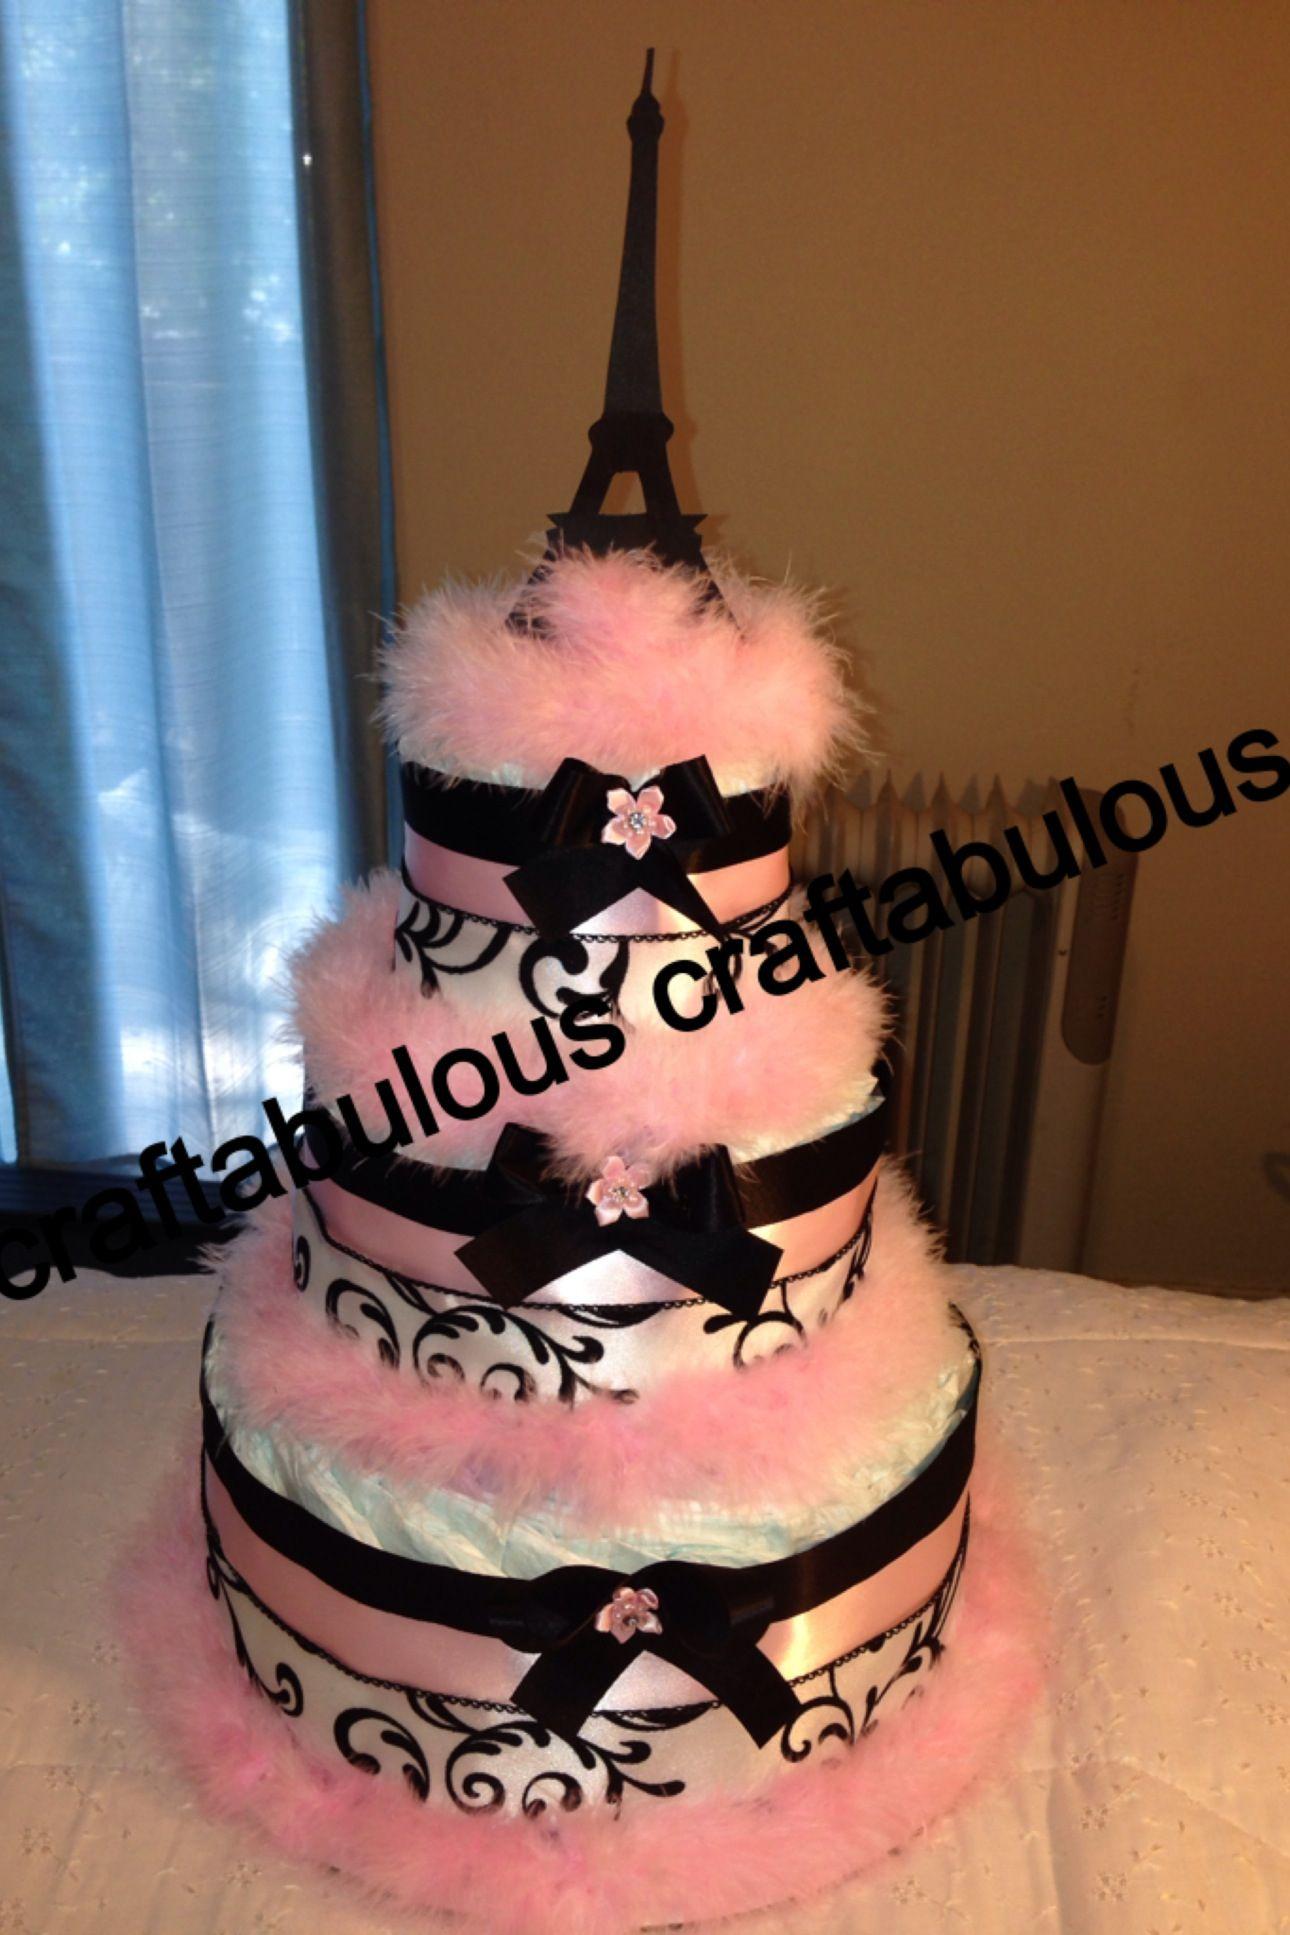 Paris Themed Diaper Cake #diapercake #paristheme #babyshower #girlbabyshower